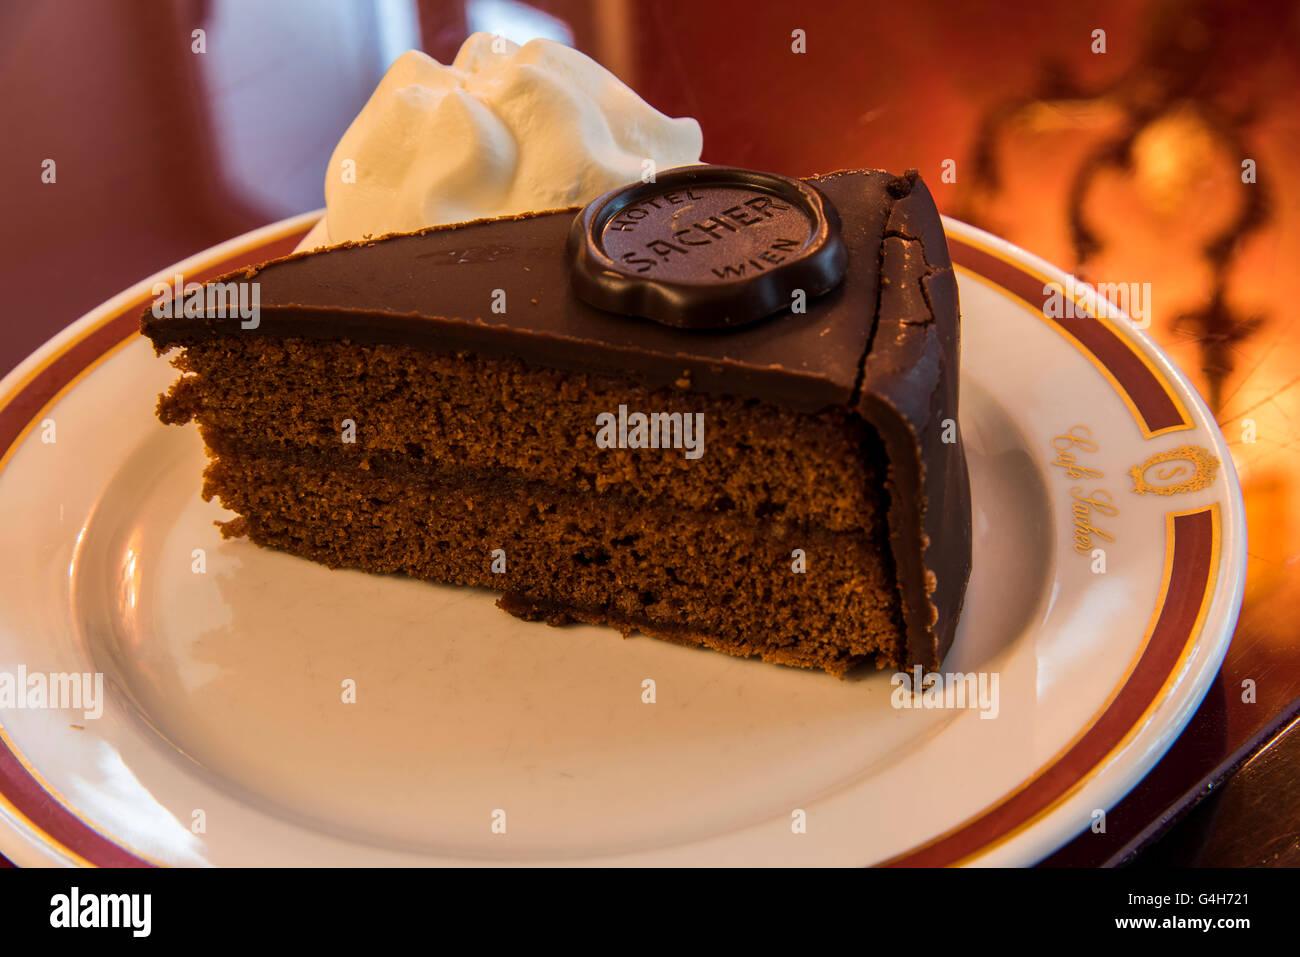 Le gâteau au chocolat Sachertorte original servi au Café Sacher, Innsbruck, Tyrol, Autriche Photo Stock